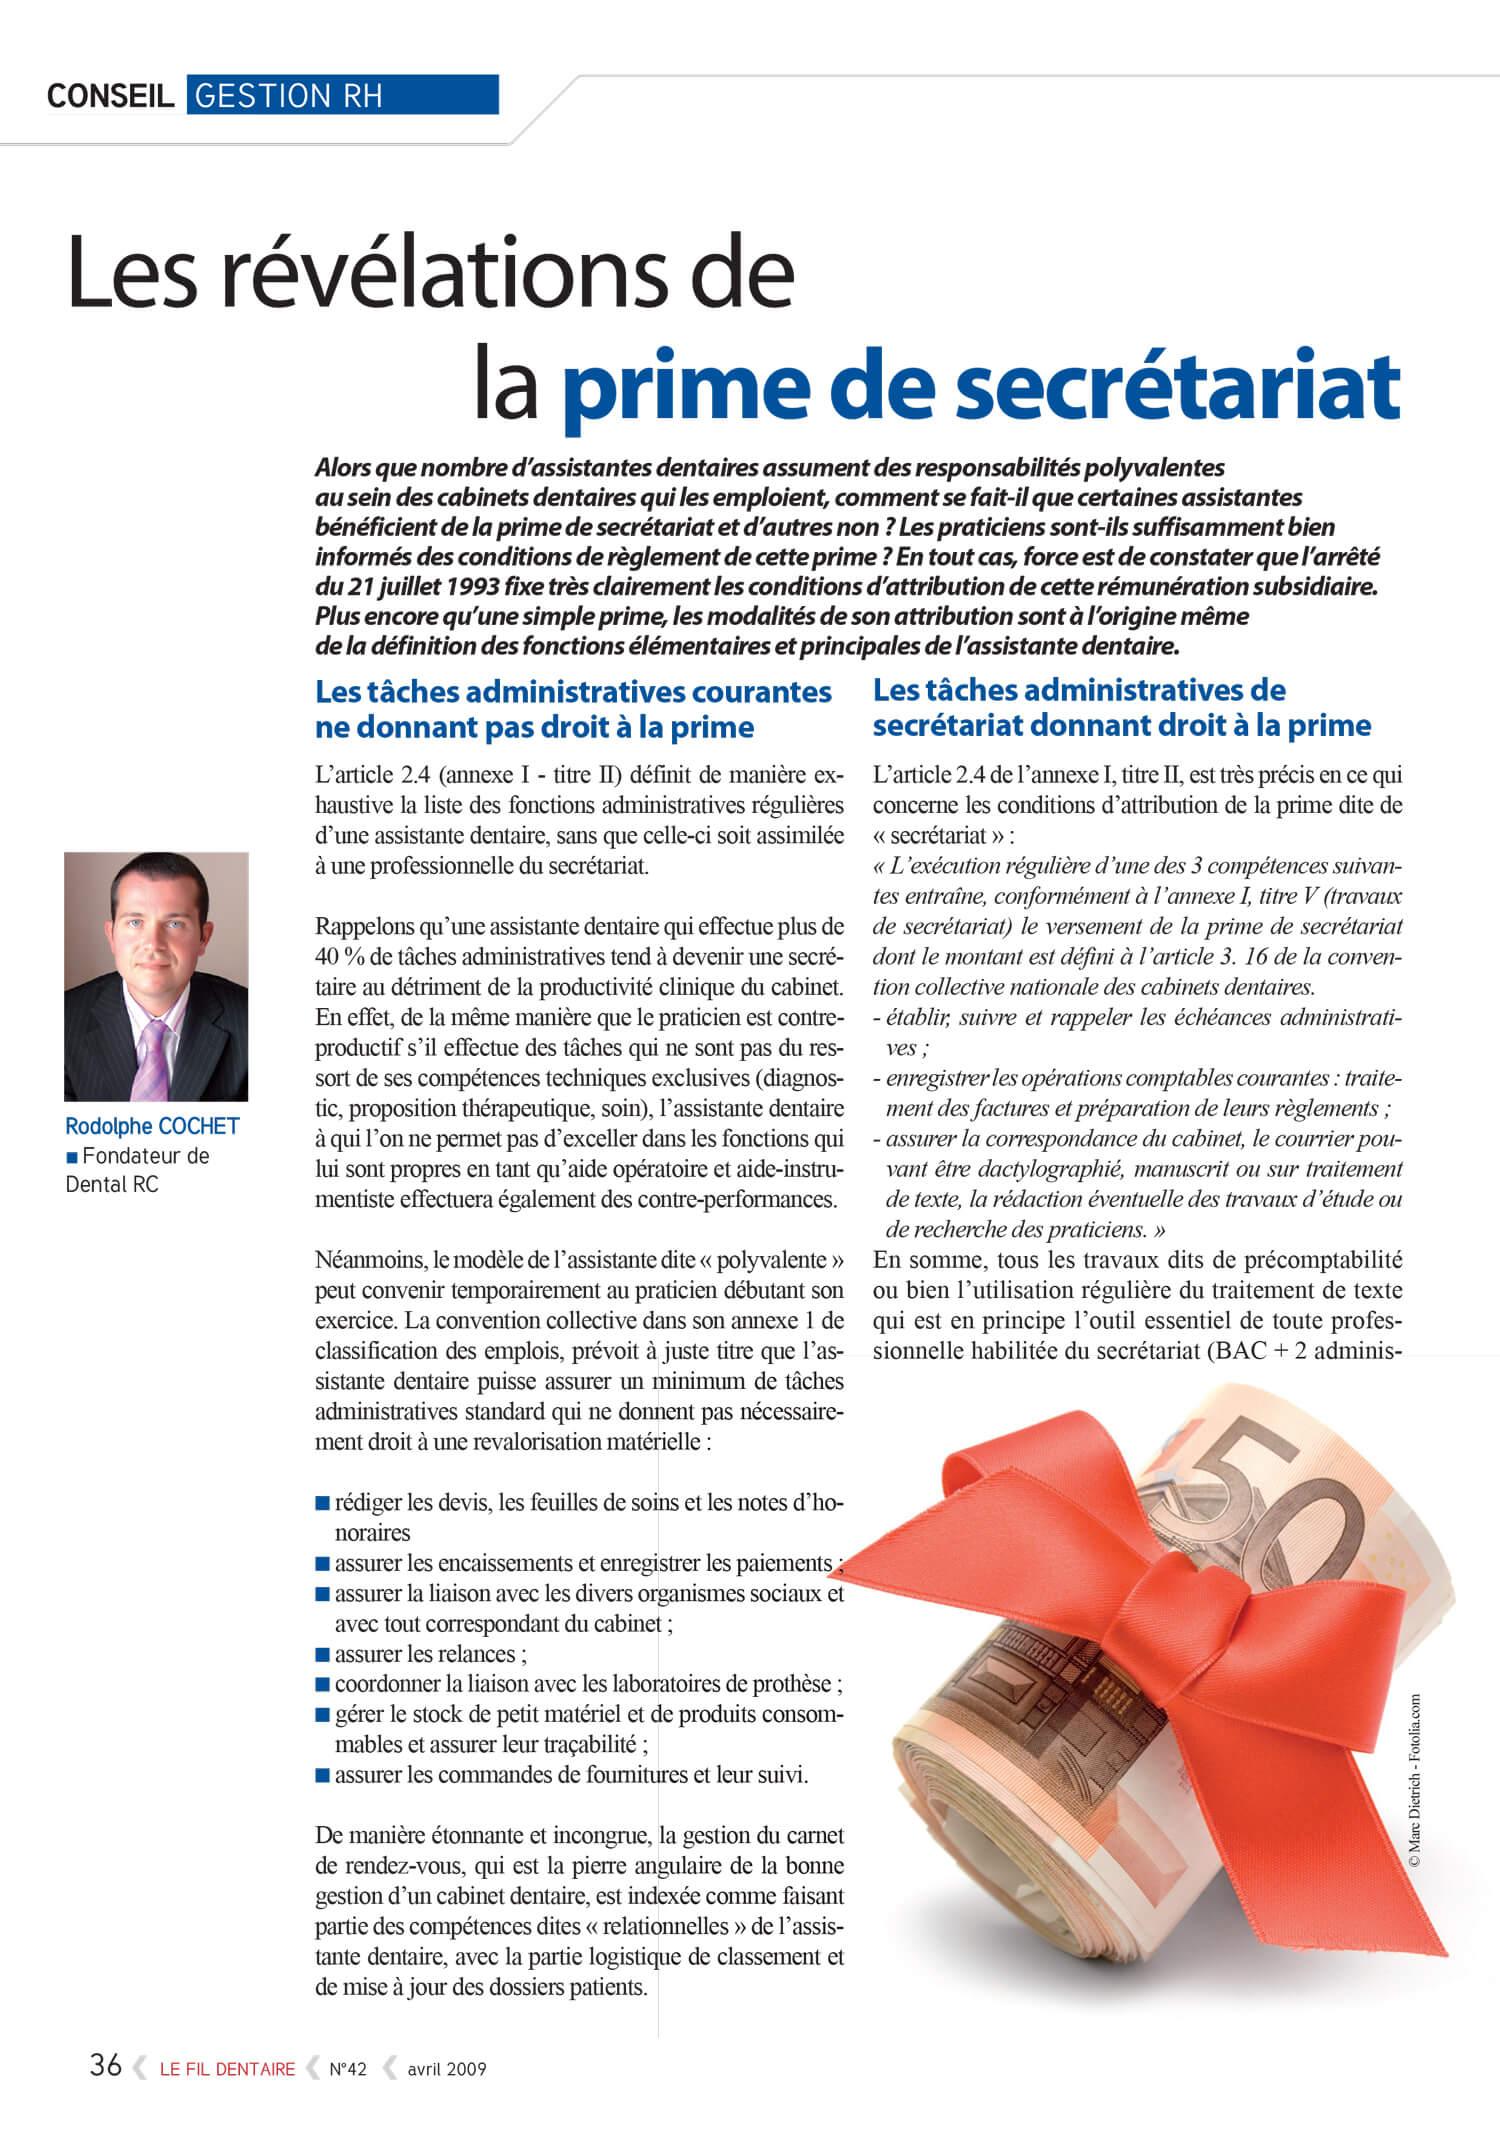 Les_revelations_prime_secretariat_assistante_dentaire_Rodolphe_Cochet.jpg